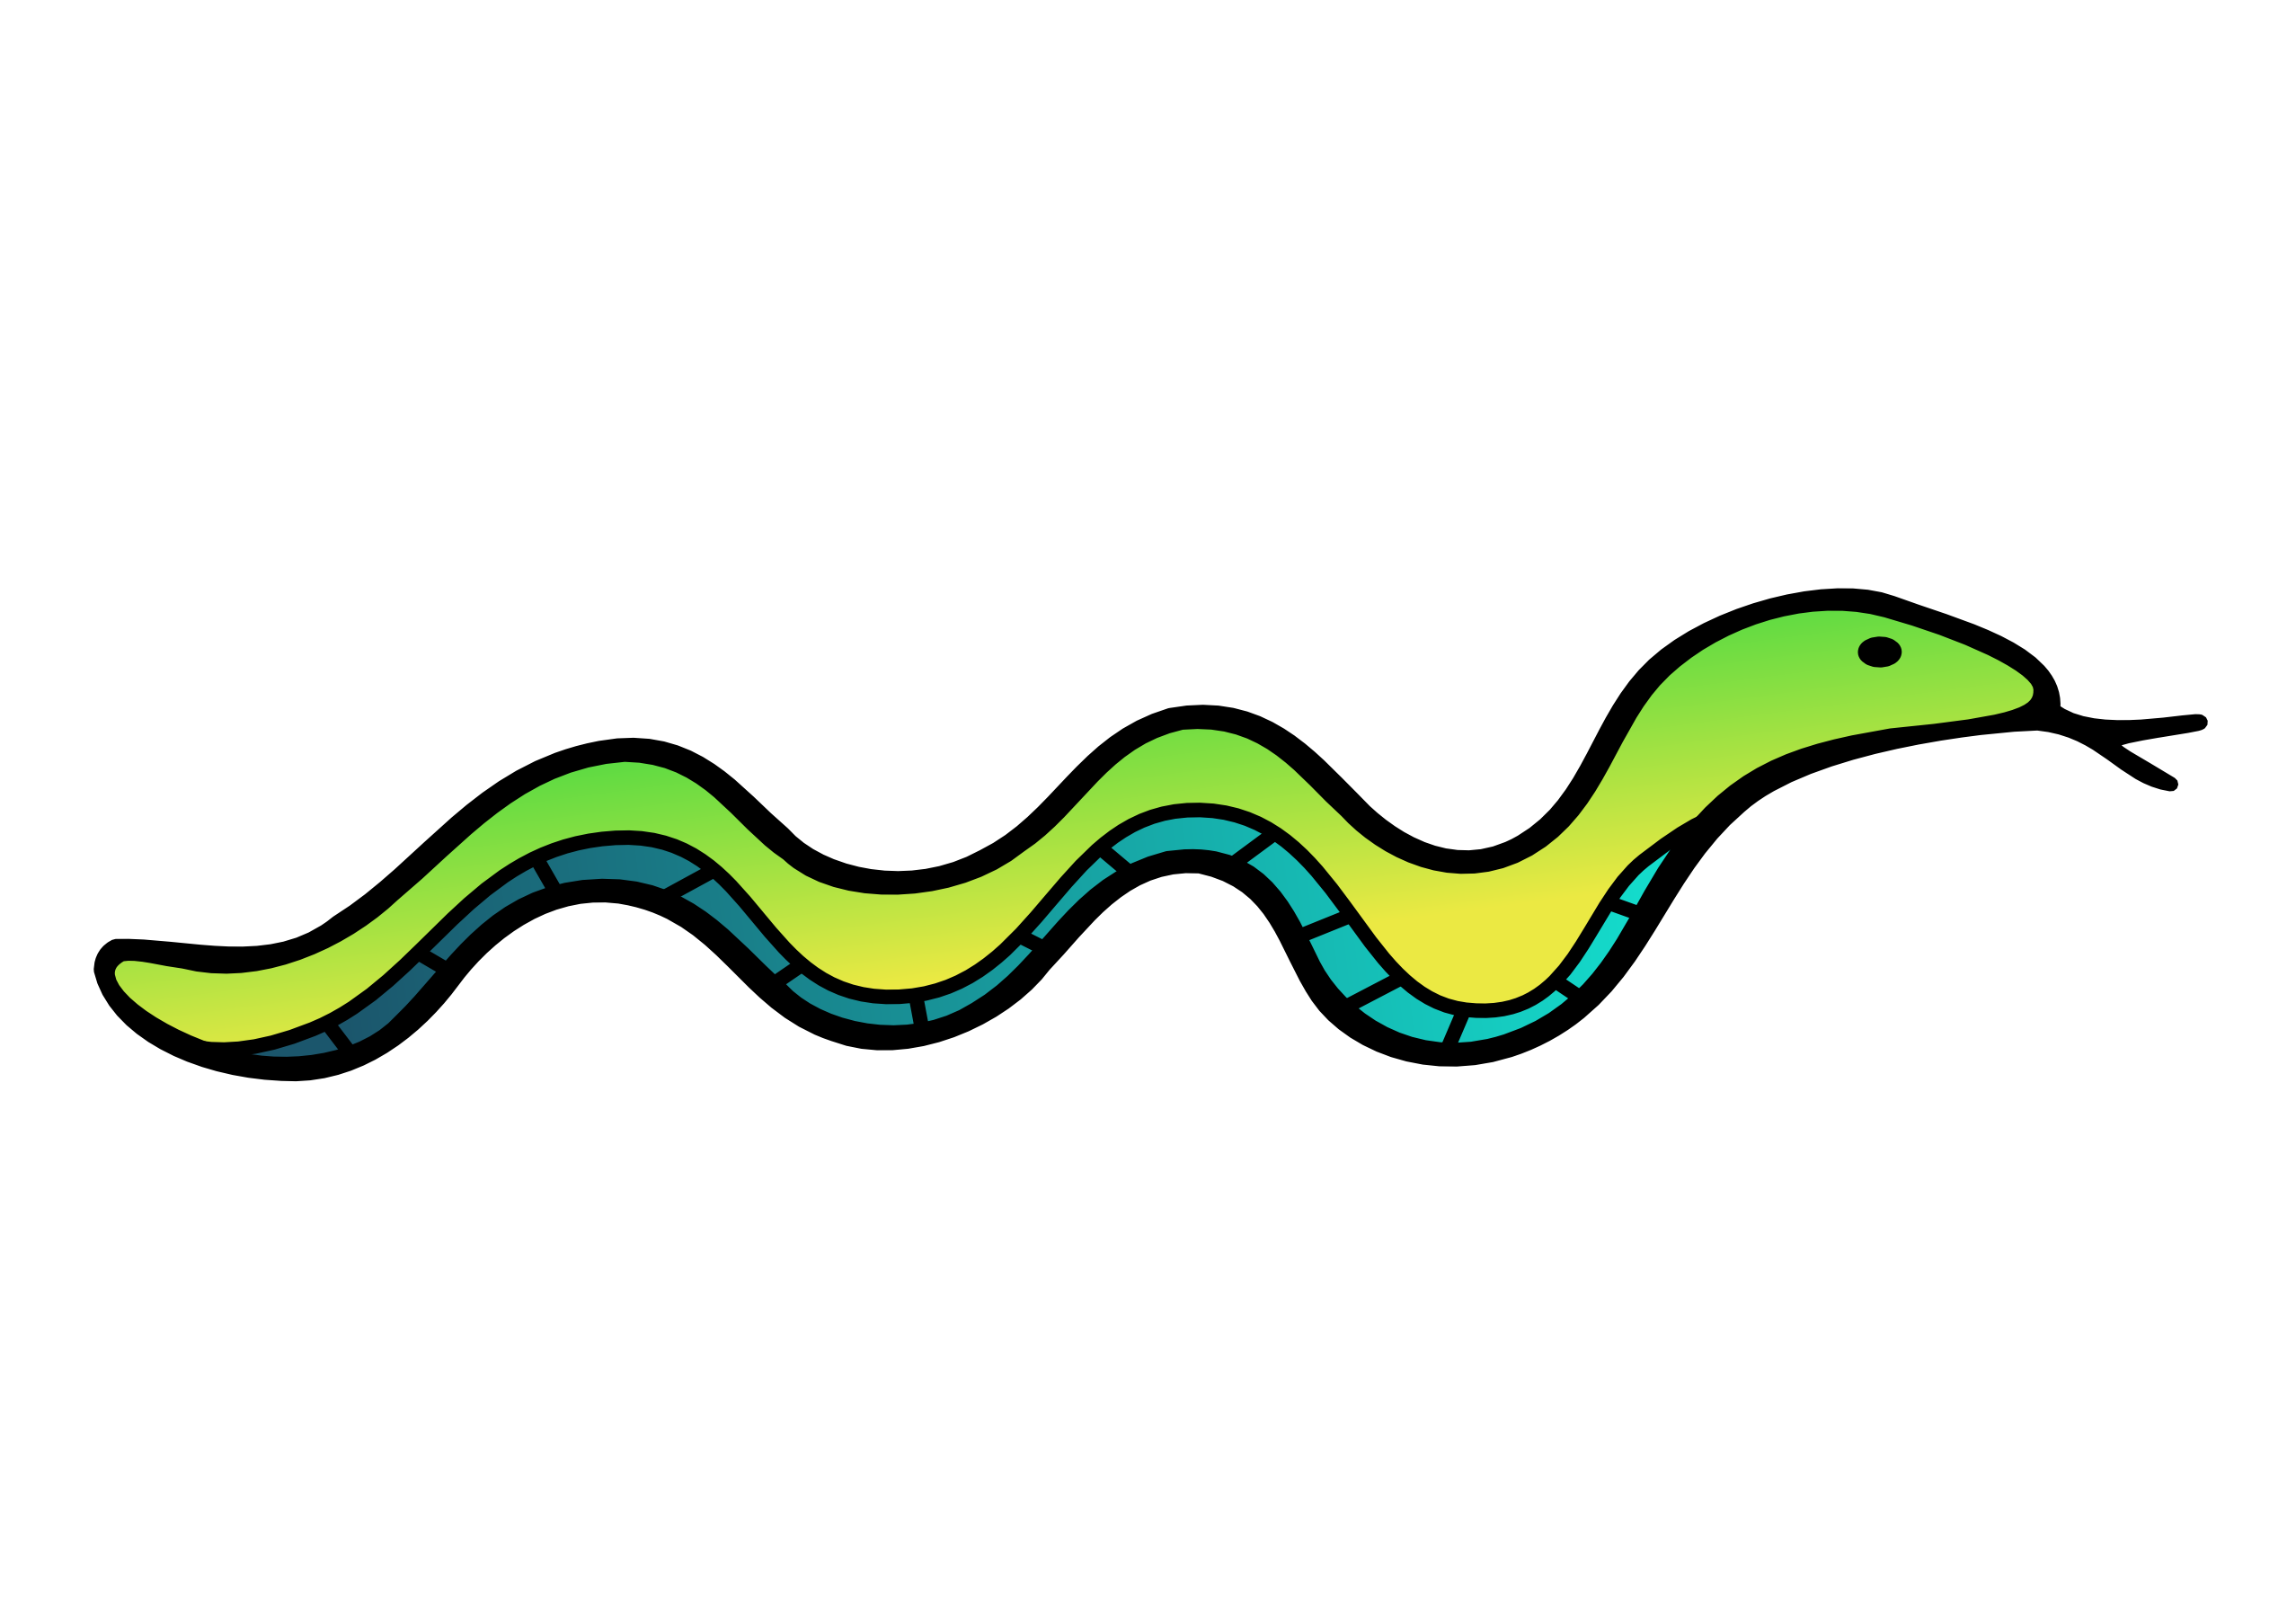 Snake clipart clipart 2